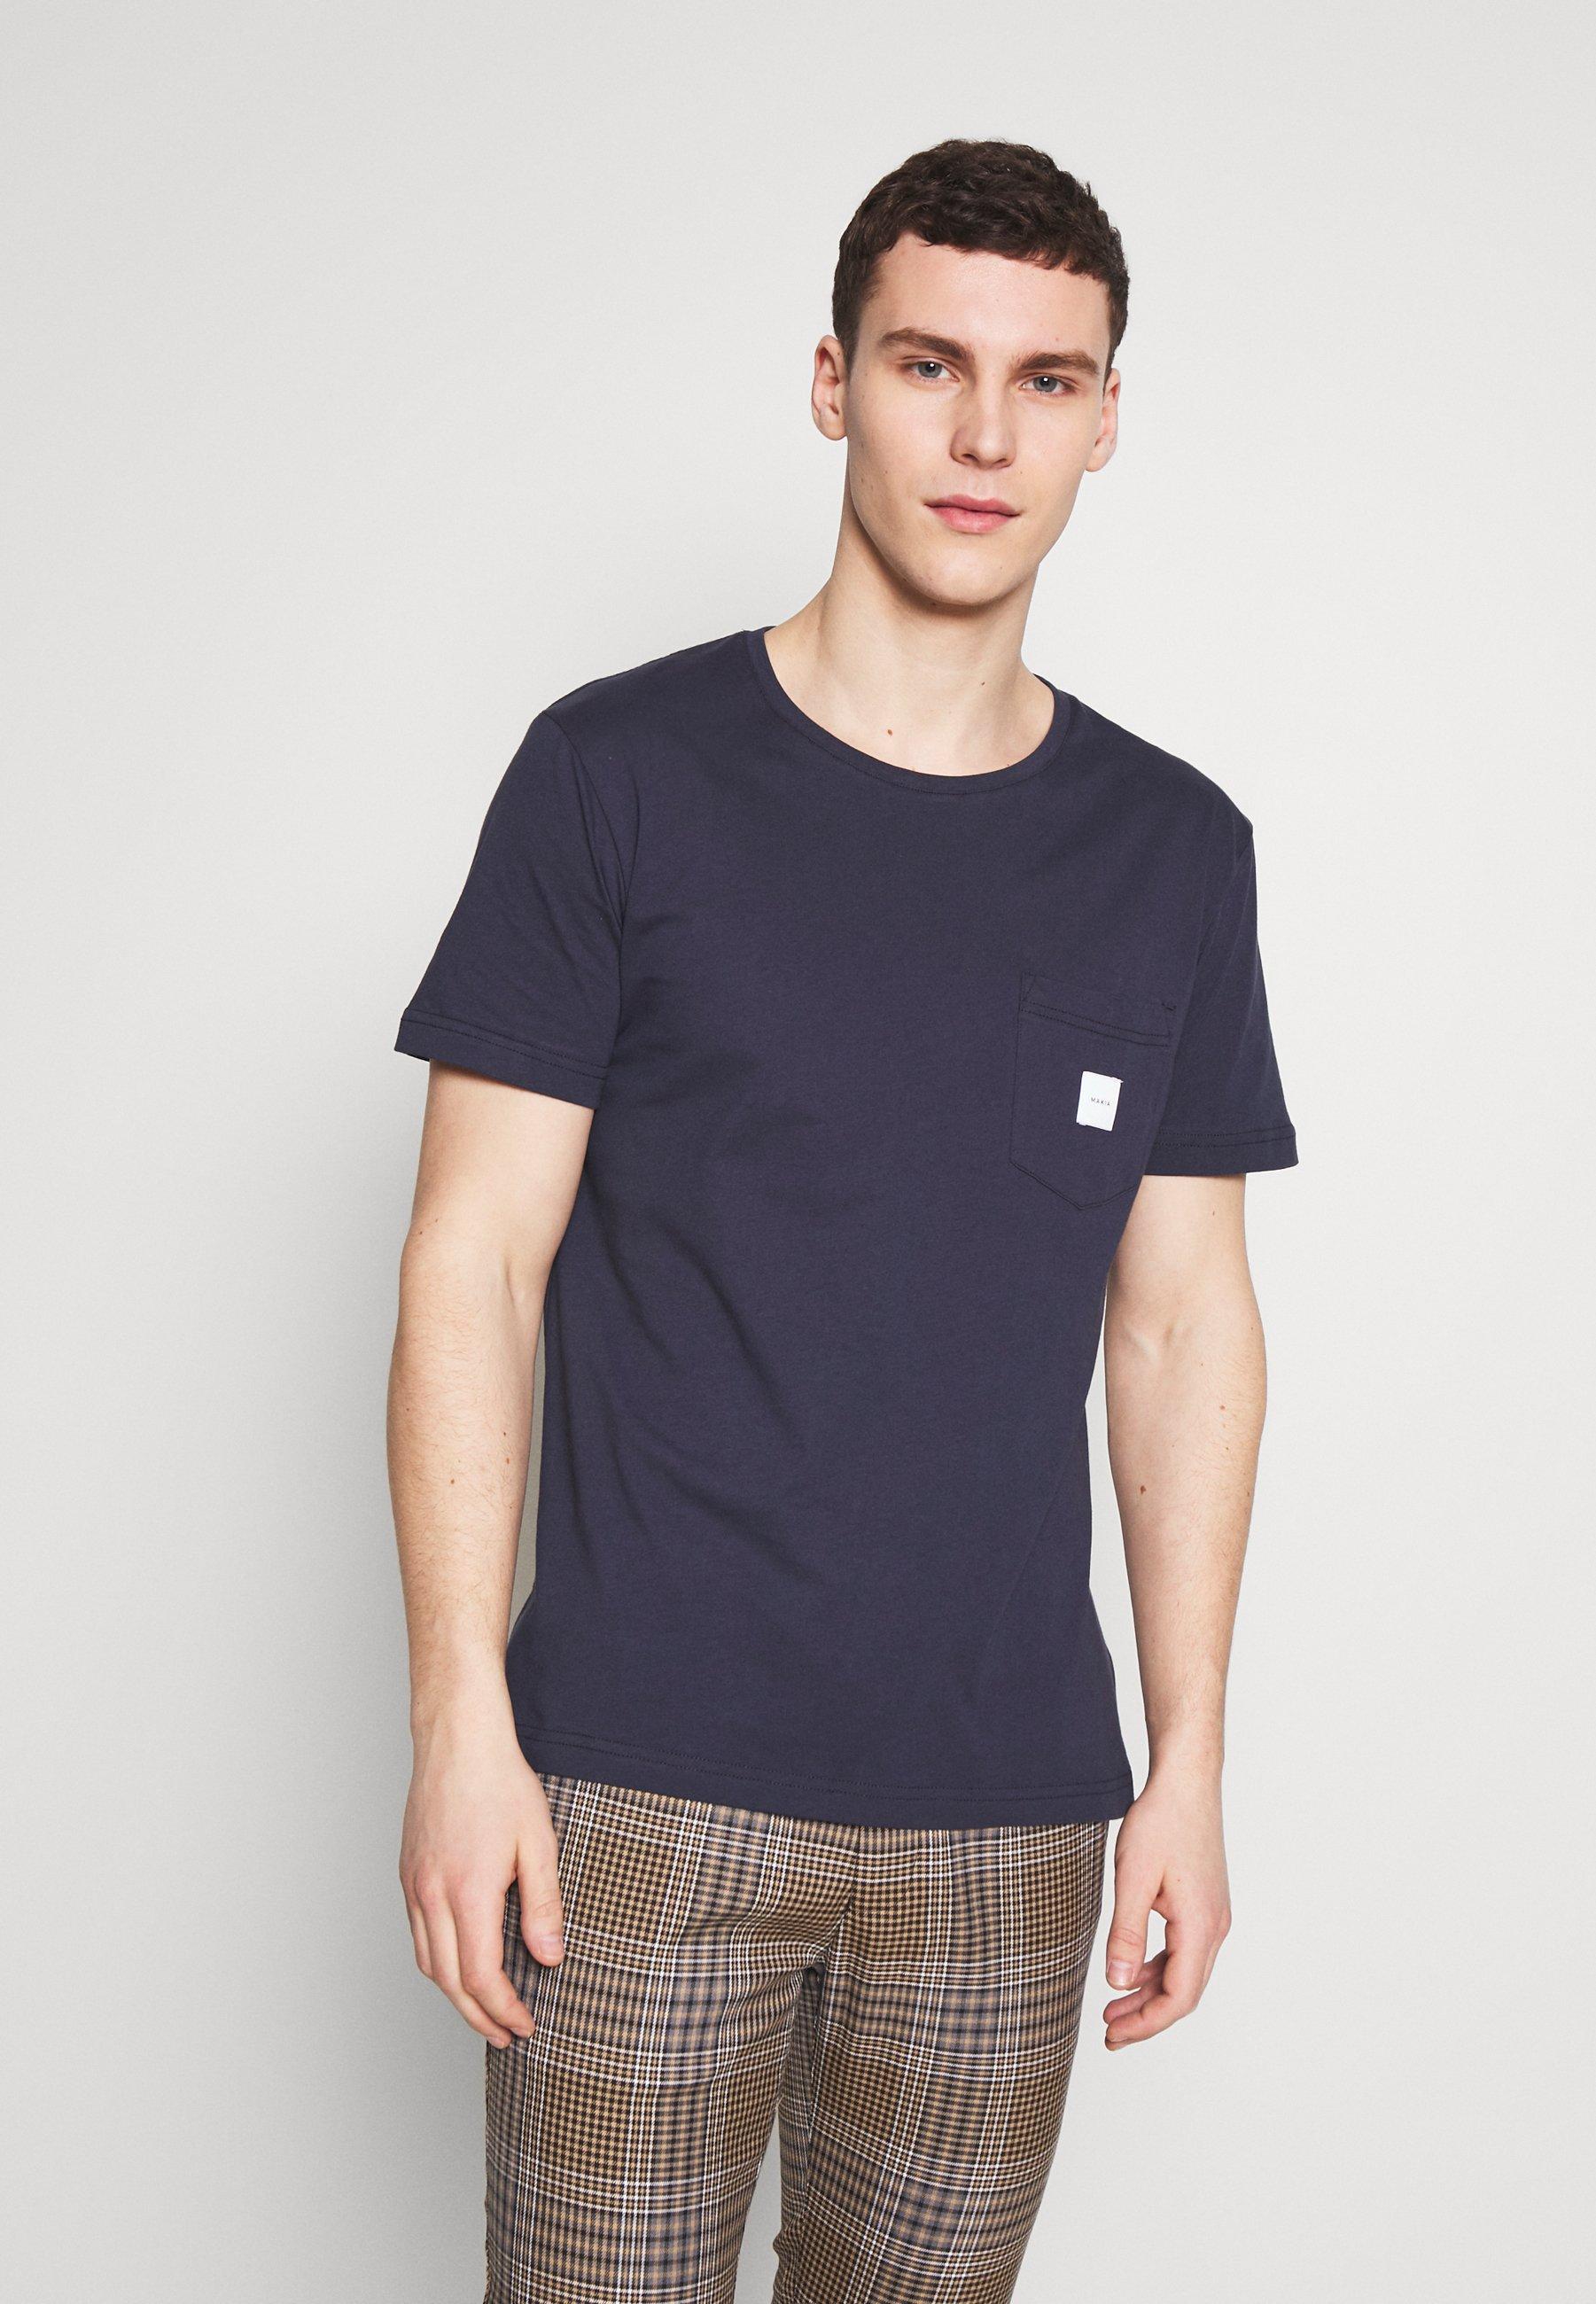 Homme SQUARE POCKET - T-shirt basique